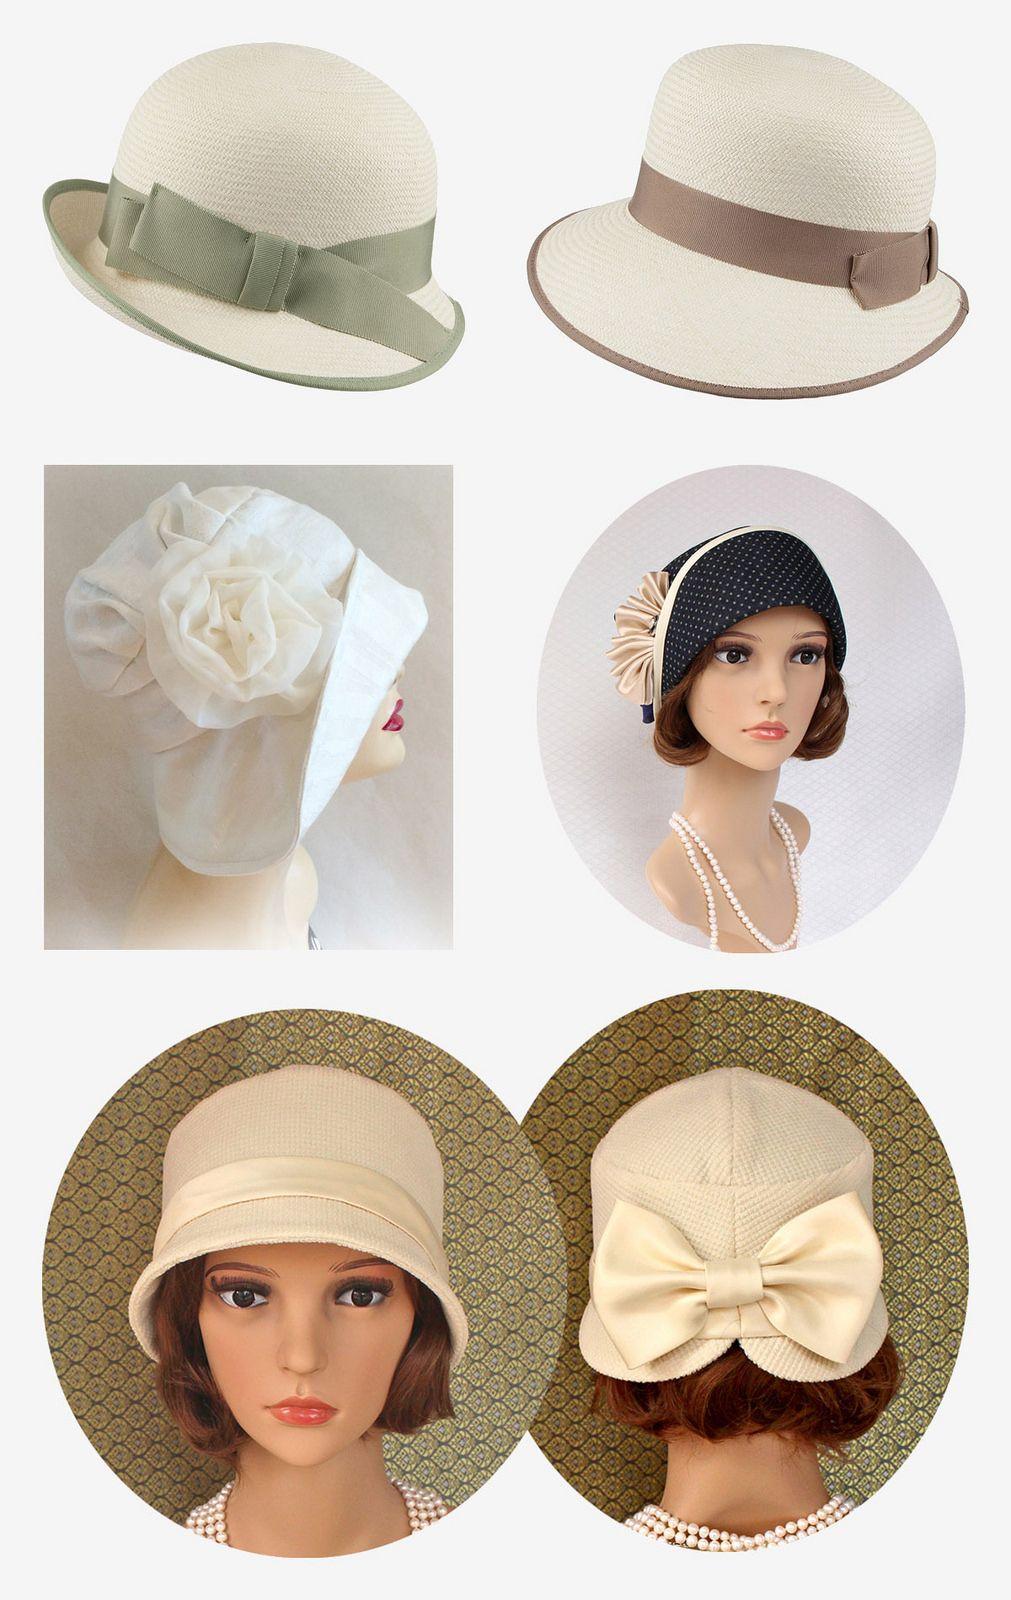 34 Modern Wedding Guest Hats and Fascinators - Cloche hats  d7f41dc972b